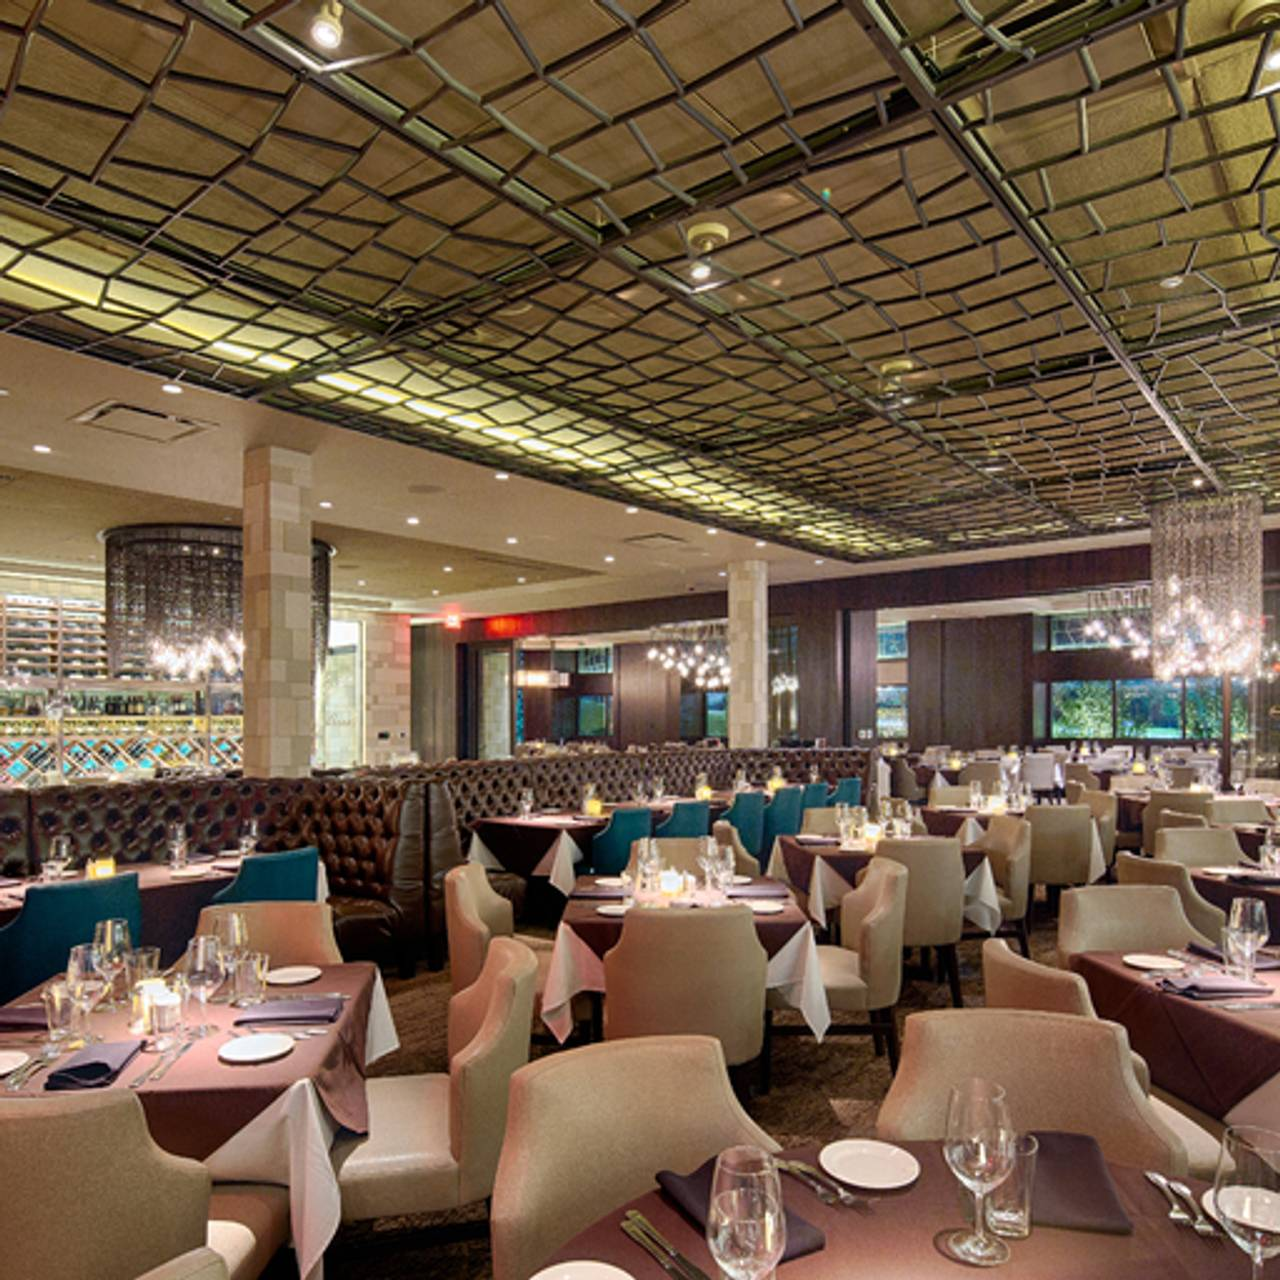 Perry S Steakhouse Grille Birmingham Al